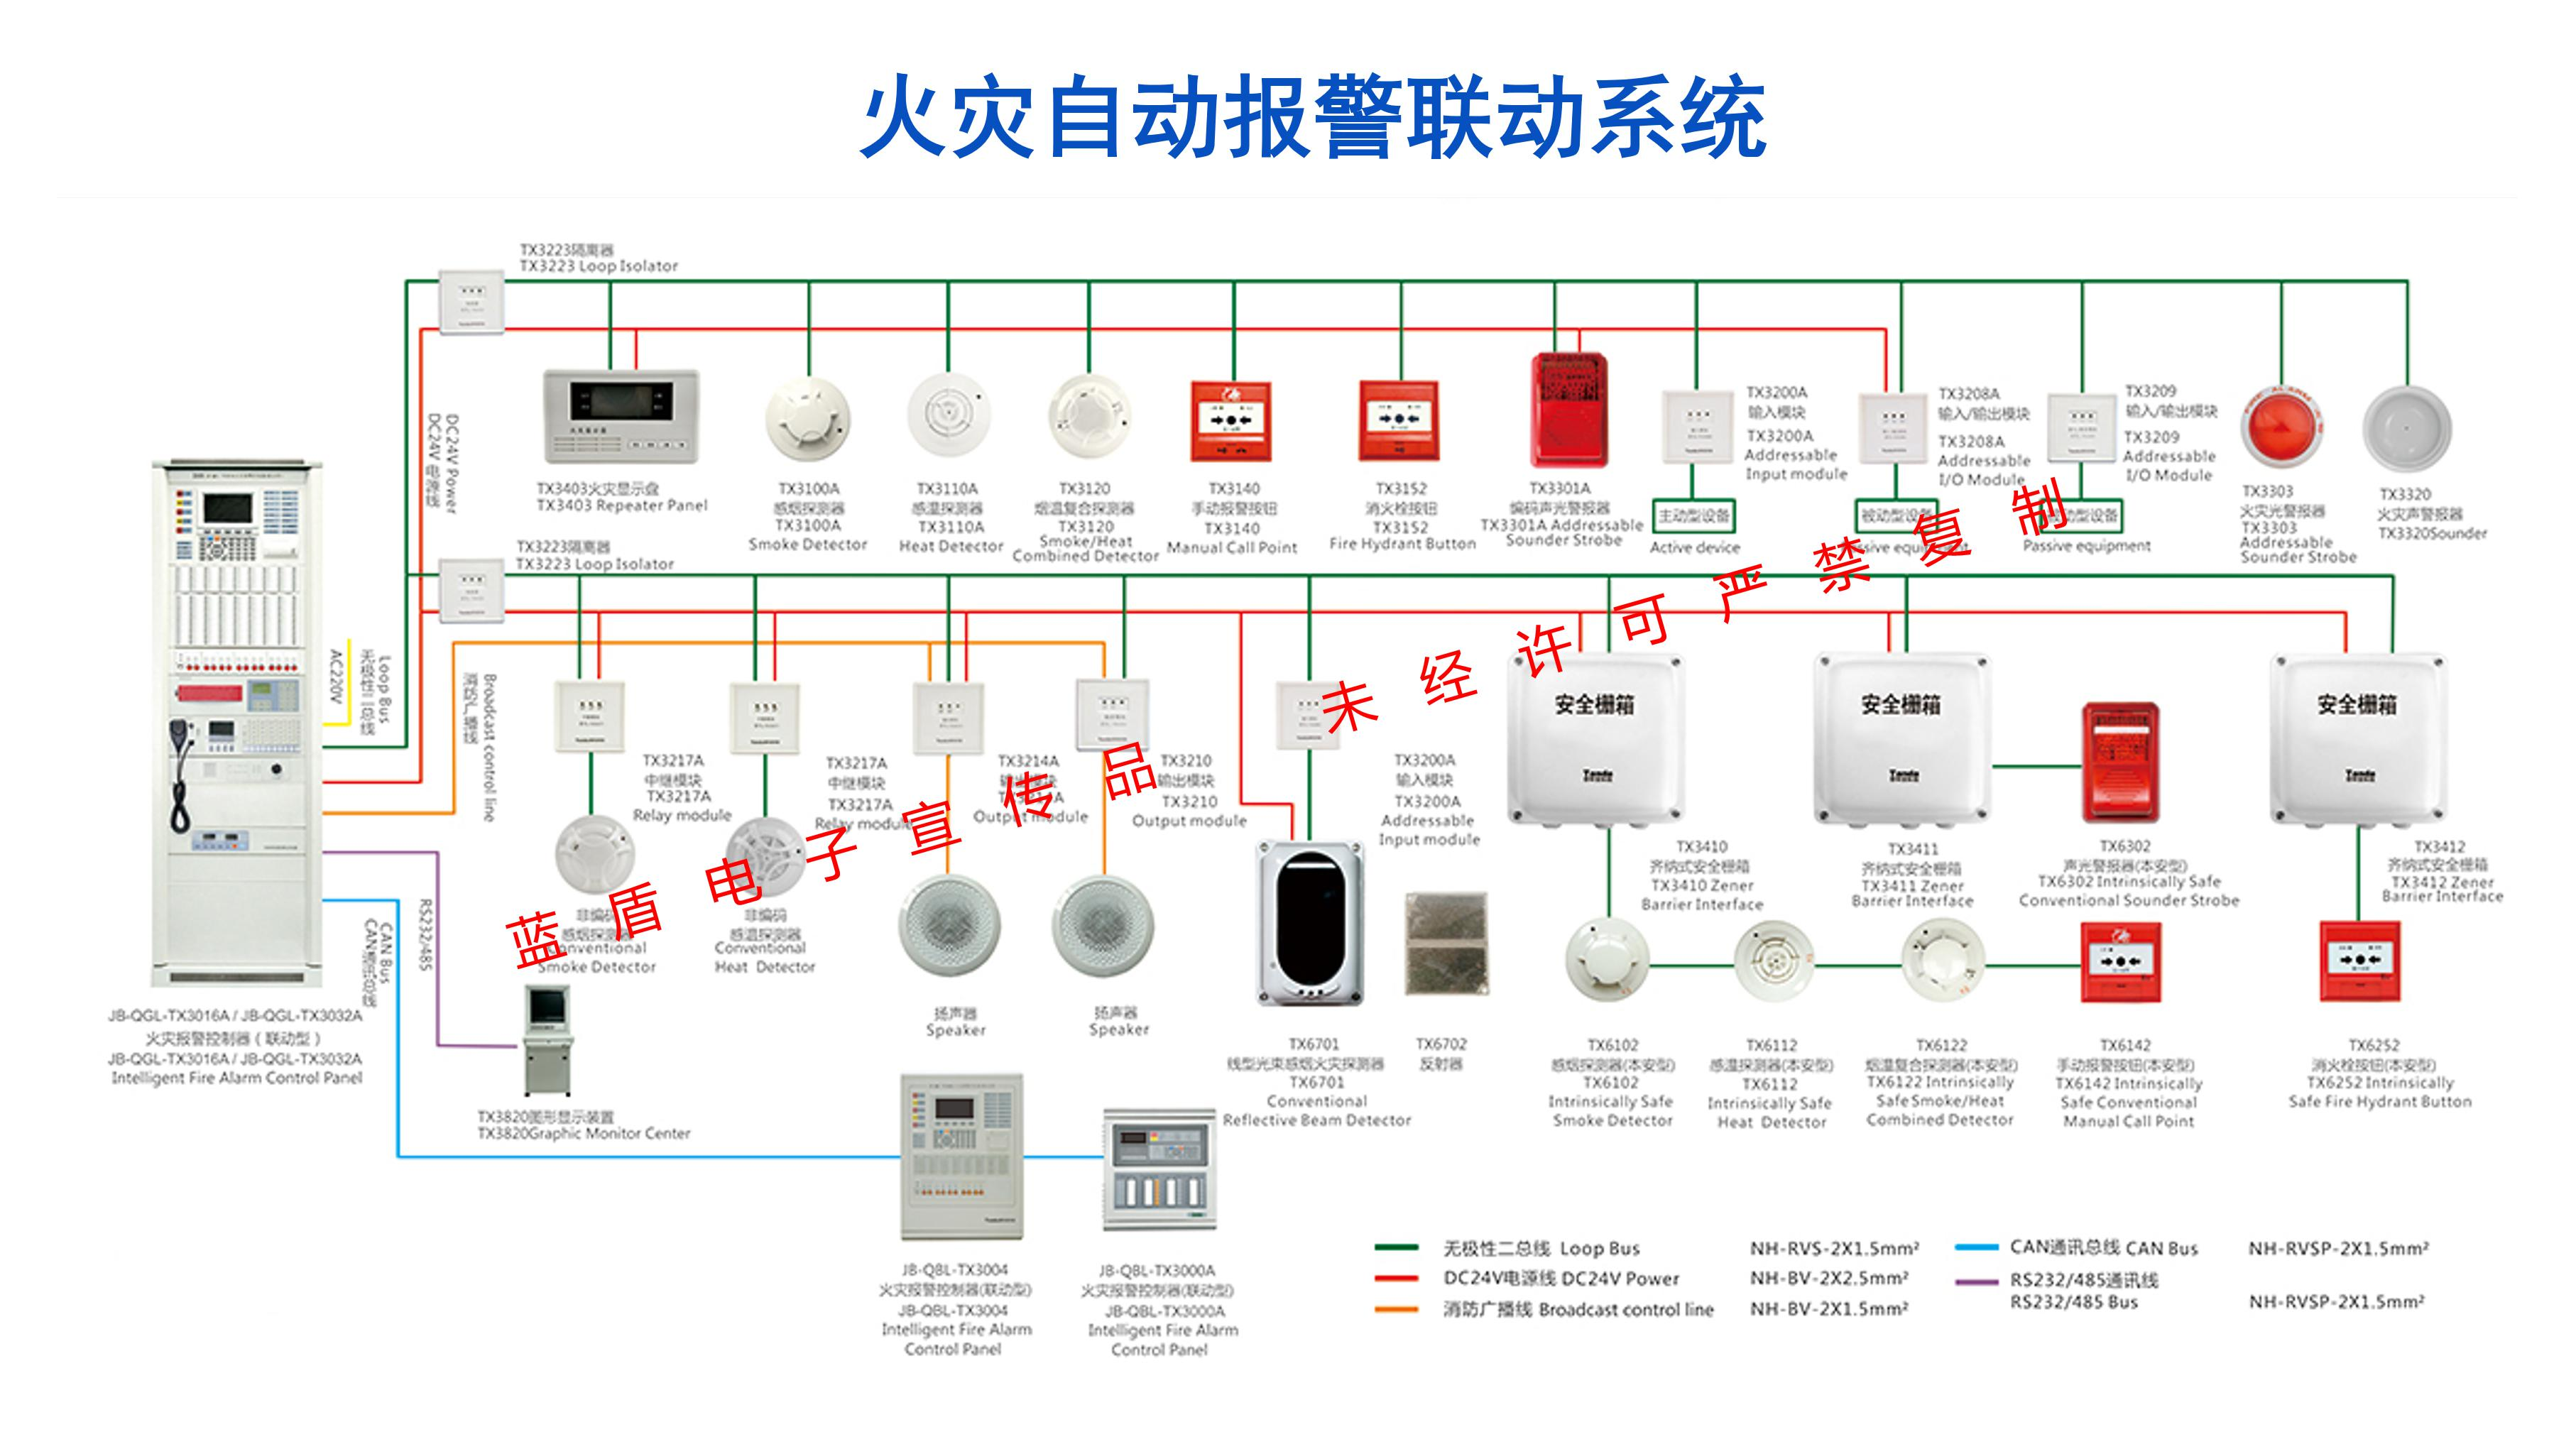 betway体育官网下载设施工程文案_02.jpg